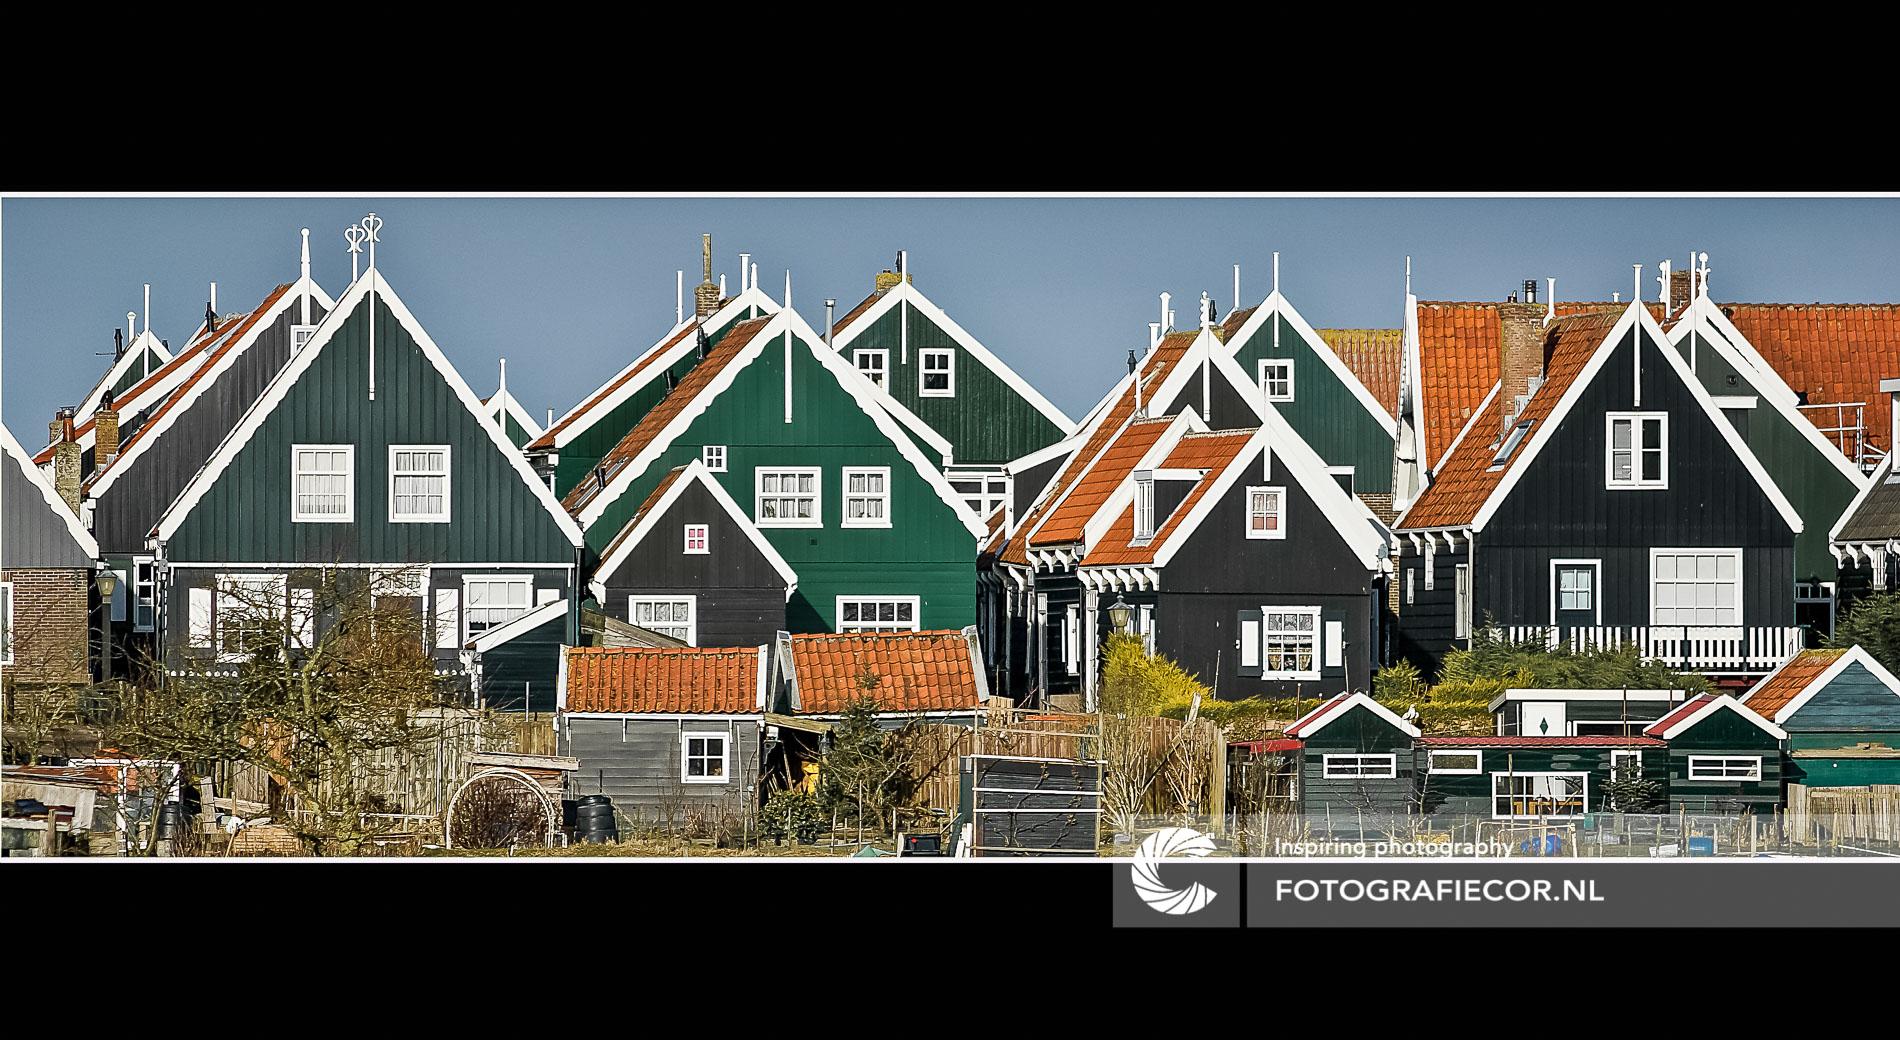 Traditionele bouwstijl eiland ,Marken | architectuurfotograaf